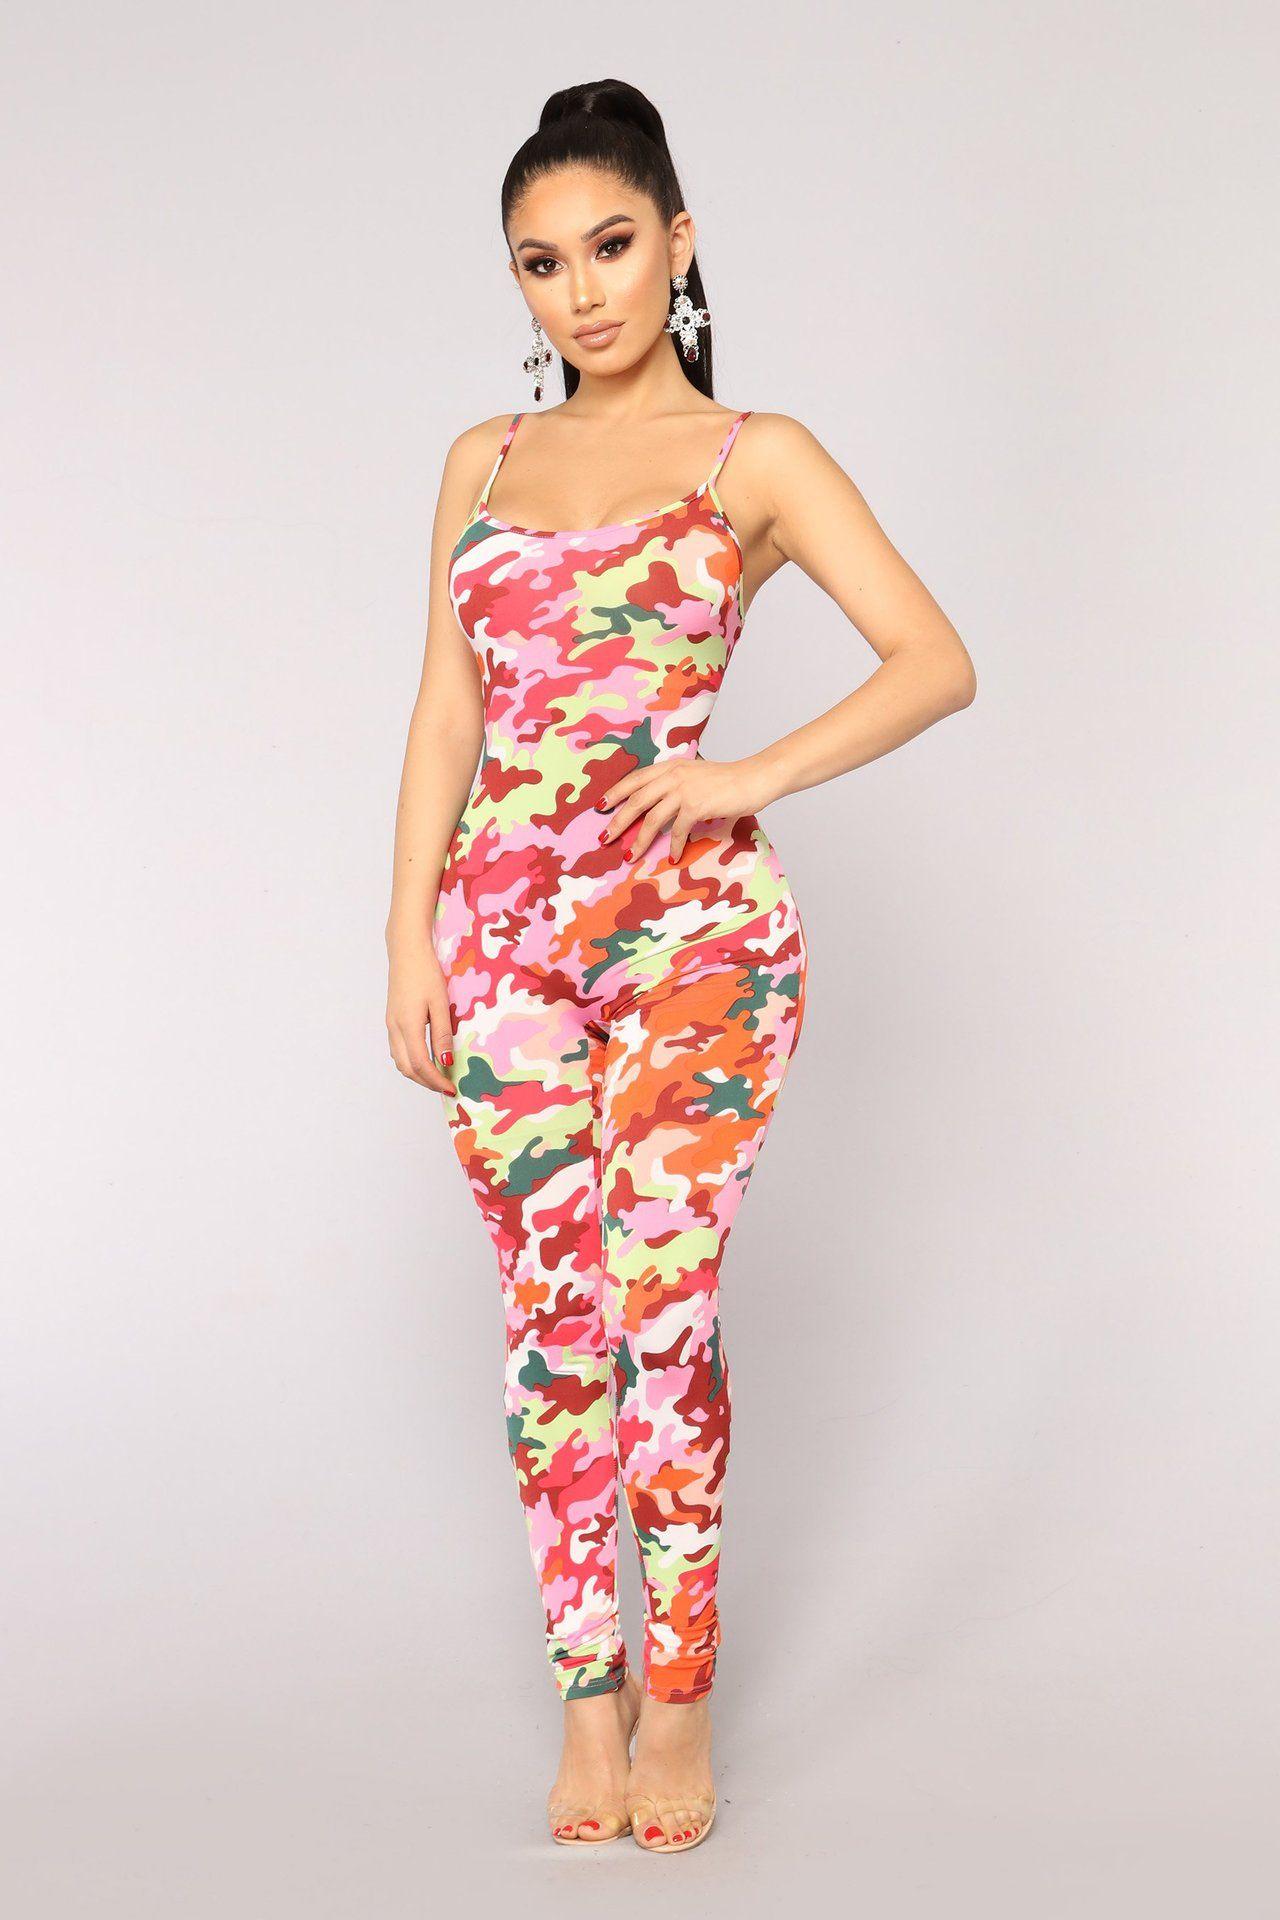 selección premium ac625 7bbe0 Compre 2019 Ropa De Moda De Sección Larga Sexy Para Mujeres Ajustadas  Cabestro Cabestrillo Cabestrillo A $21.65 Del Blinda1224 | DHgate.Com